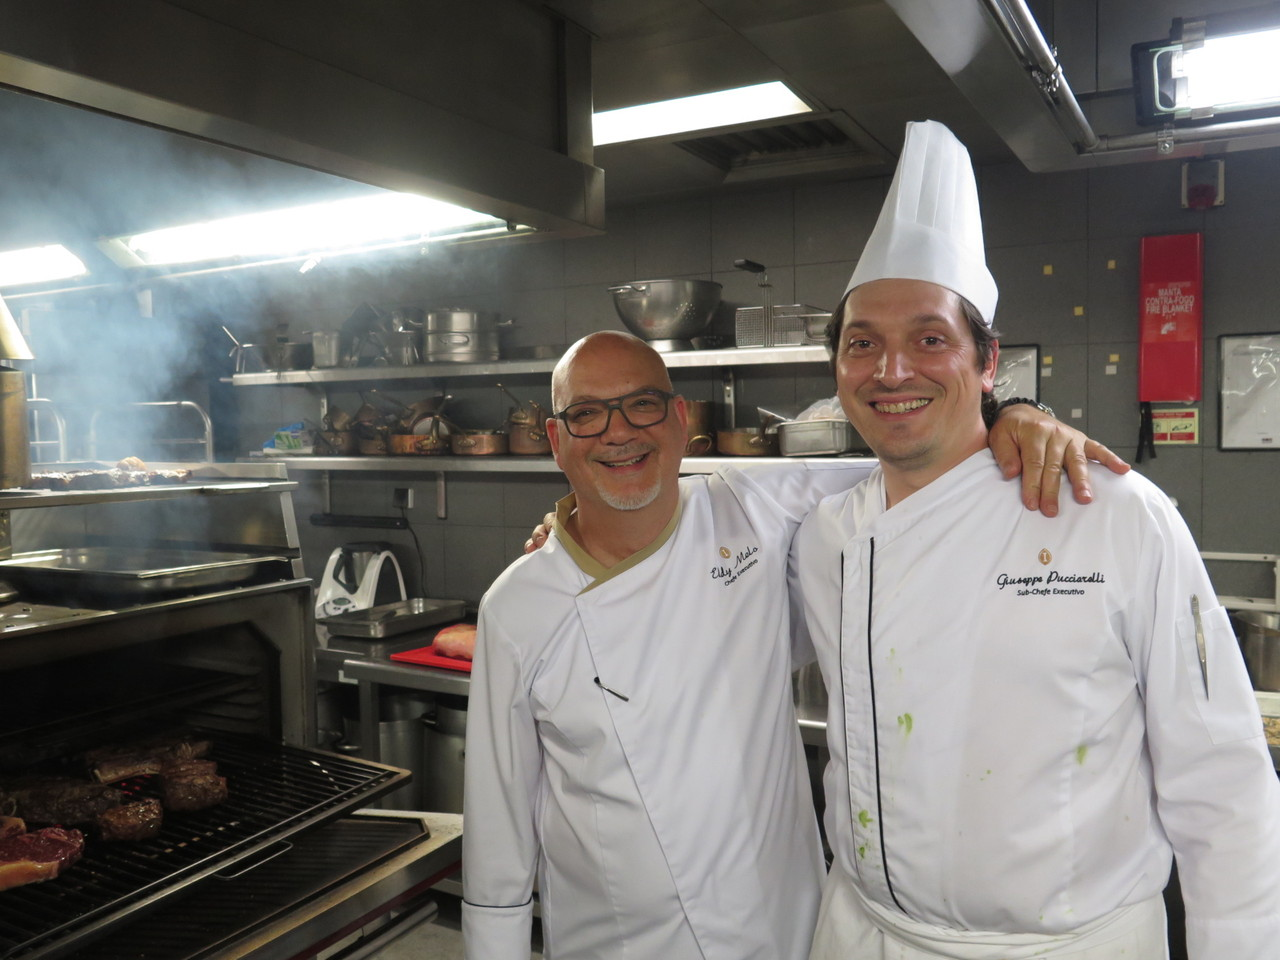 Eddy Melo e o sub-chef Giuseppe Pucciarelli